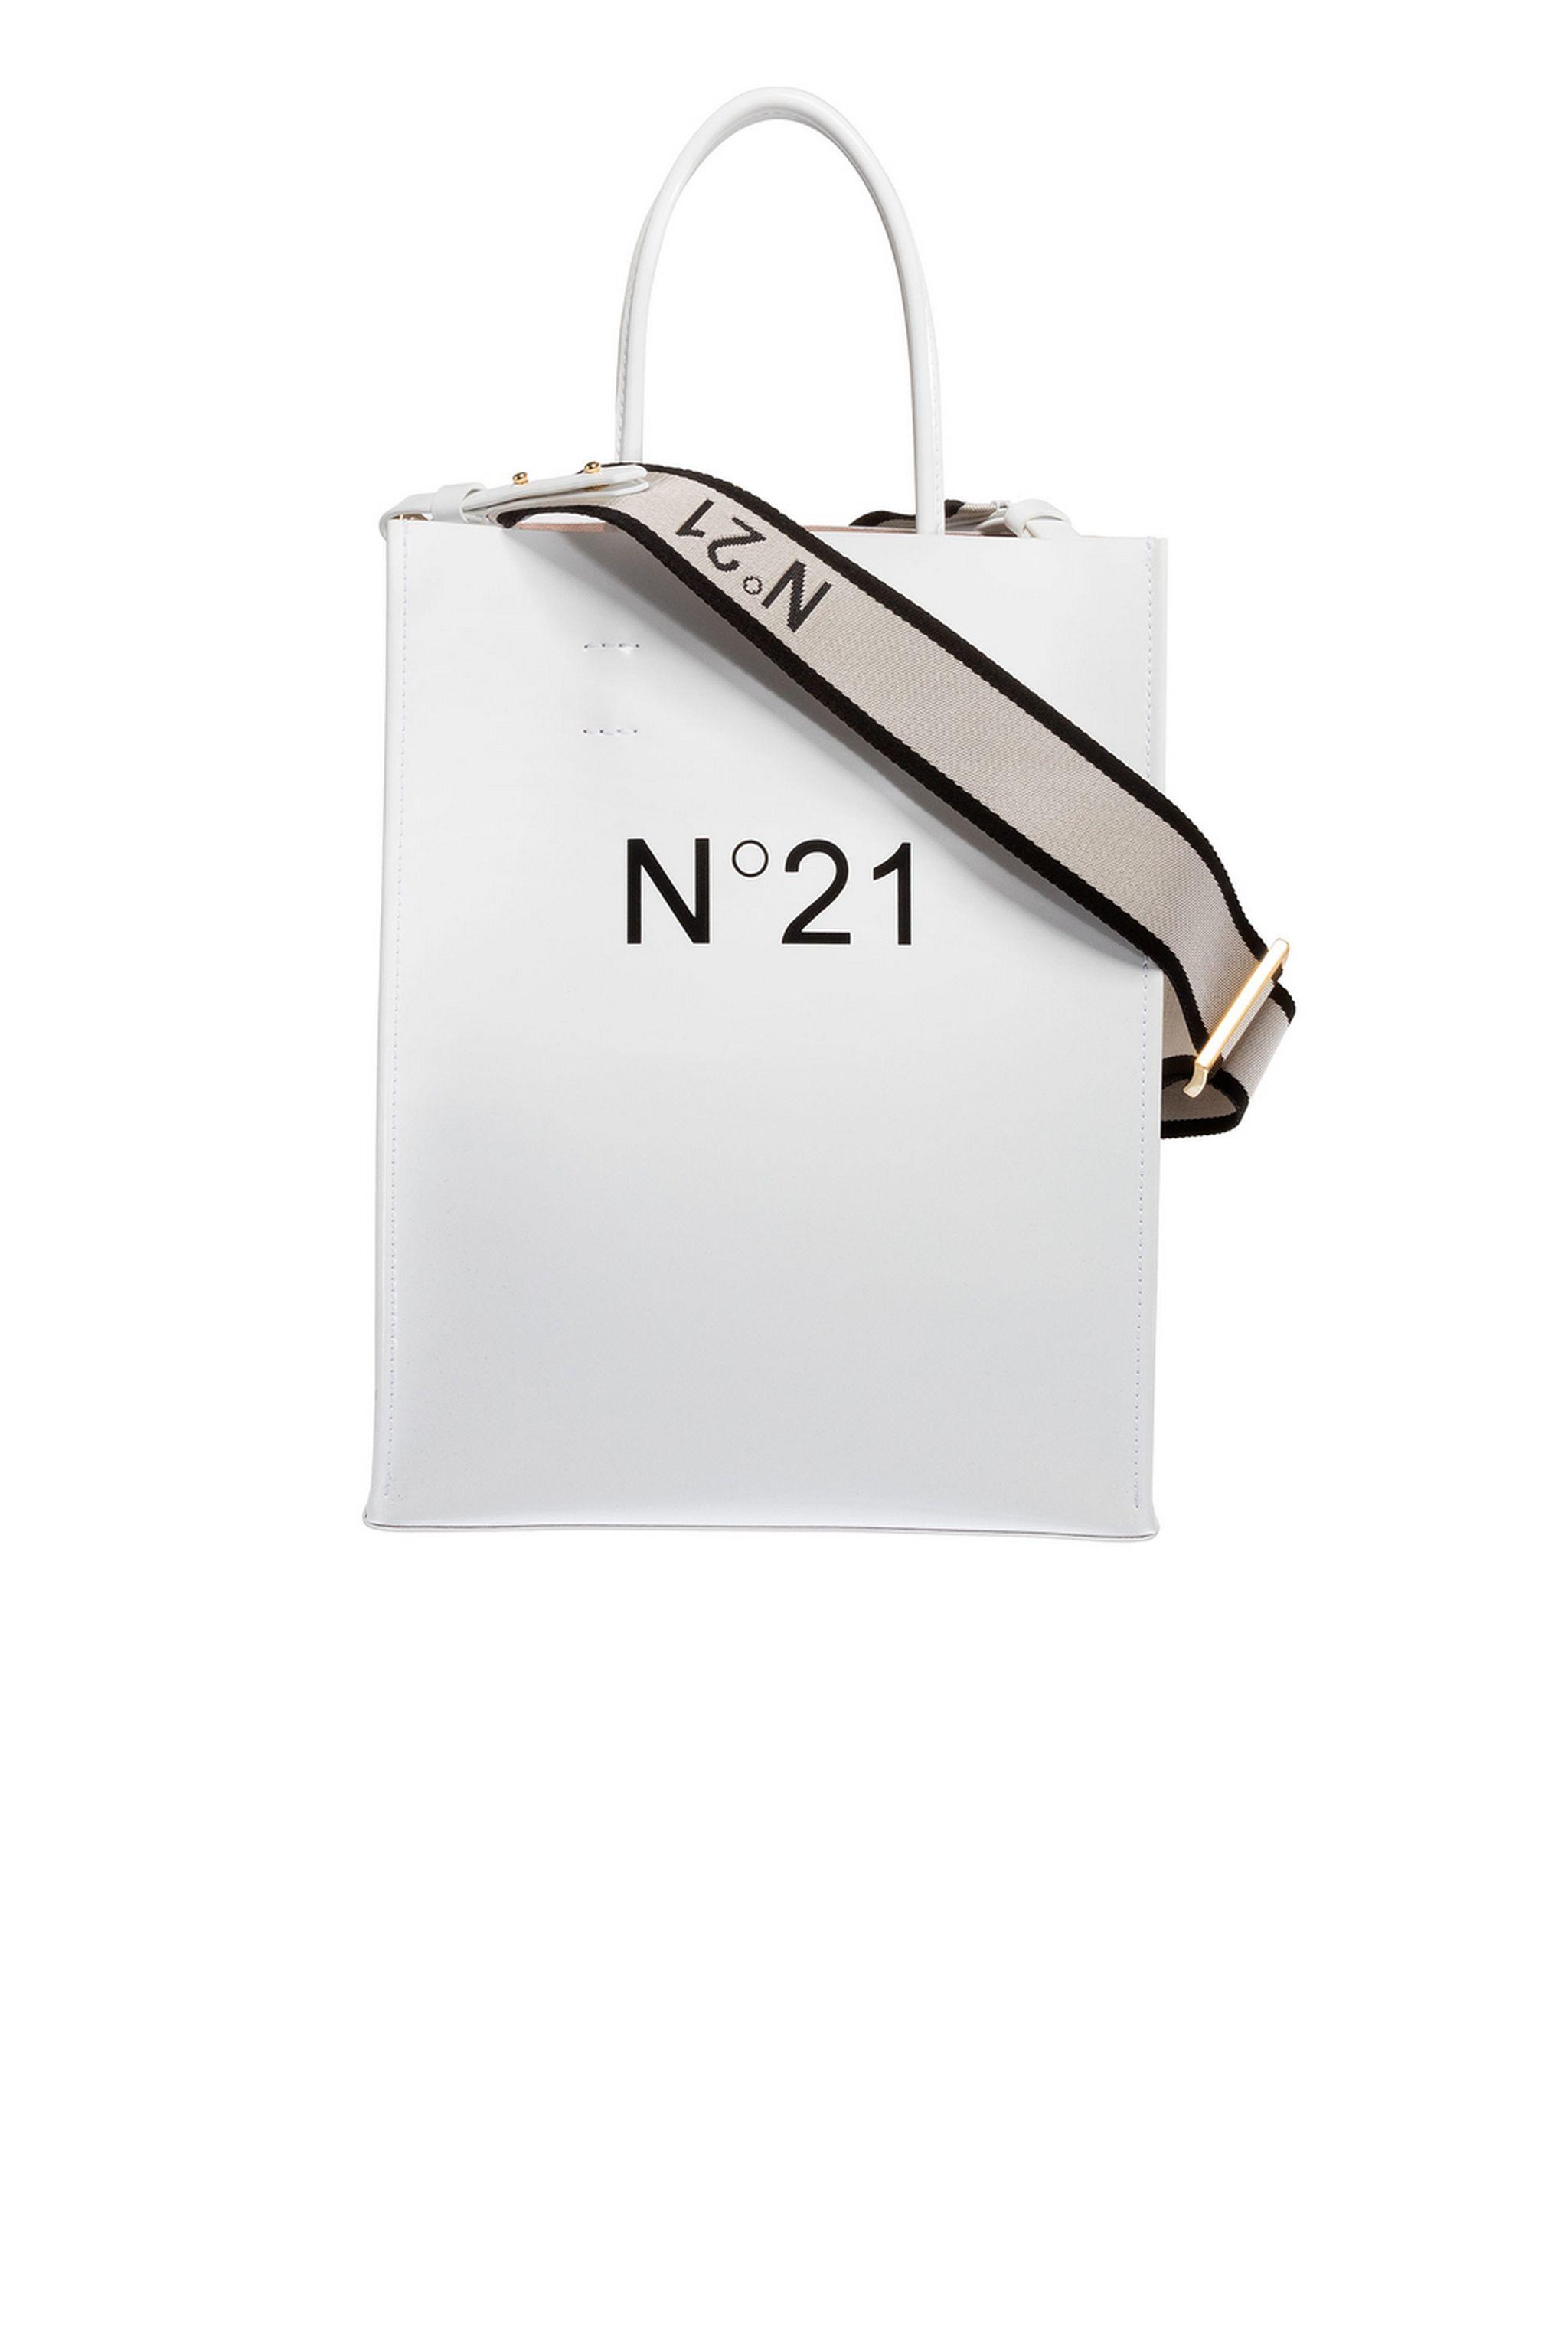 no21-small-logo-print-shopper_13147518_15517344_2048